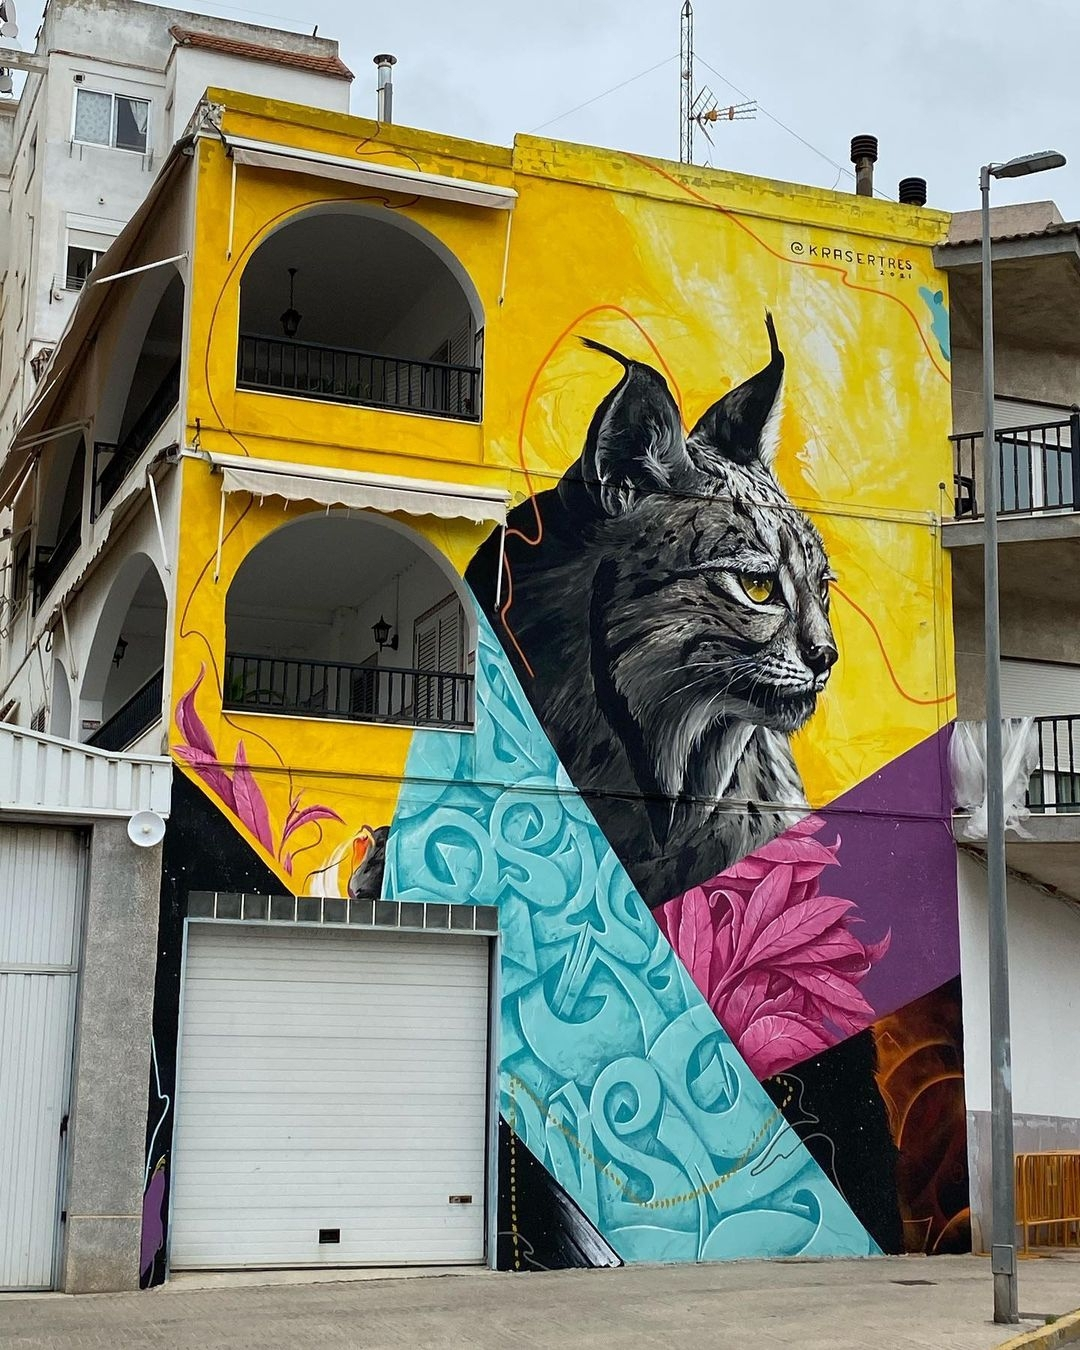 Kraser @ Alberic, Spain